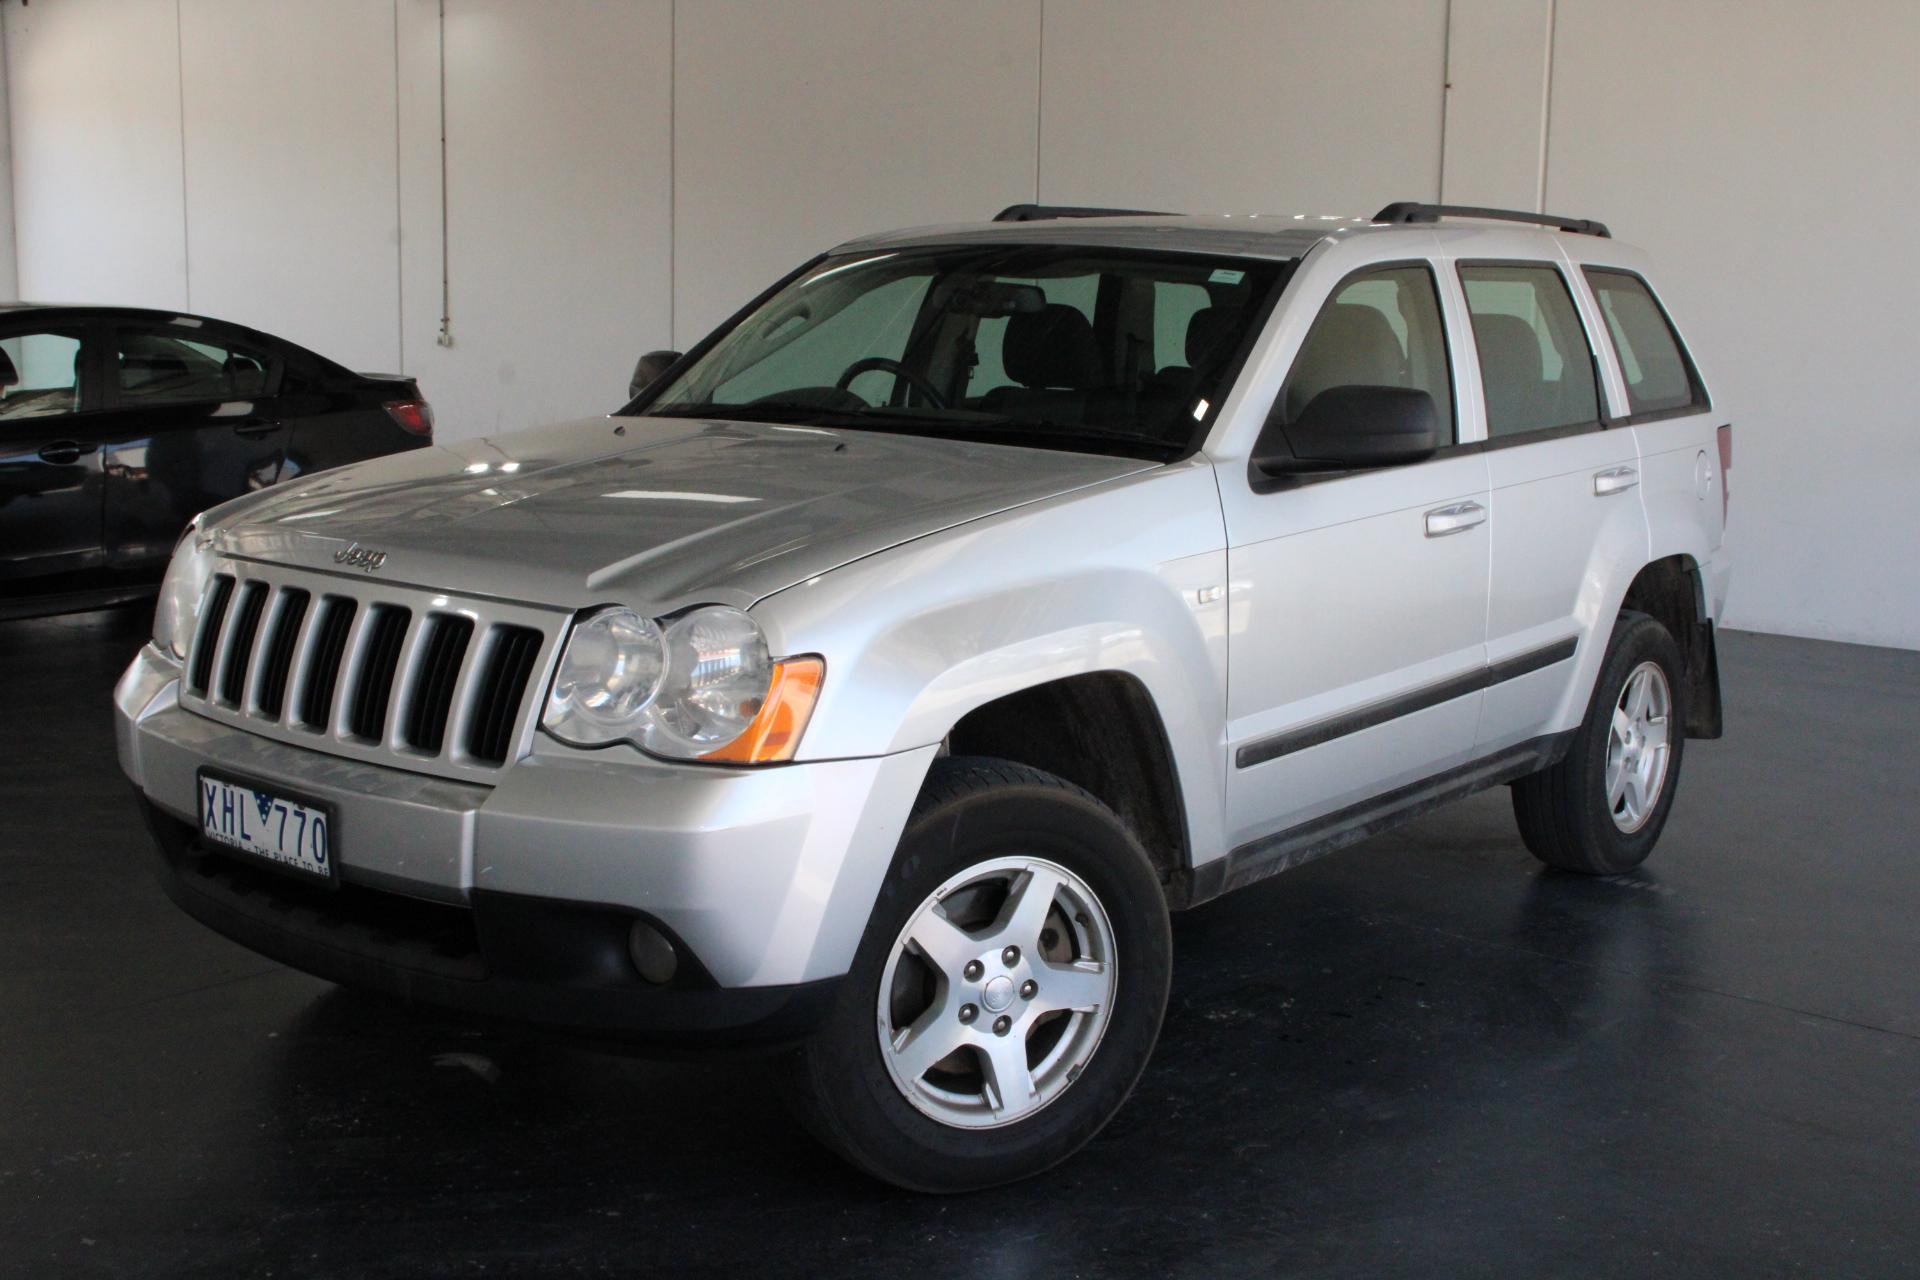 2009 Jeep Grand Cherokee Laredo (4x4) WH Turbo Diesel Automatic Wagon